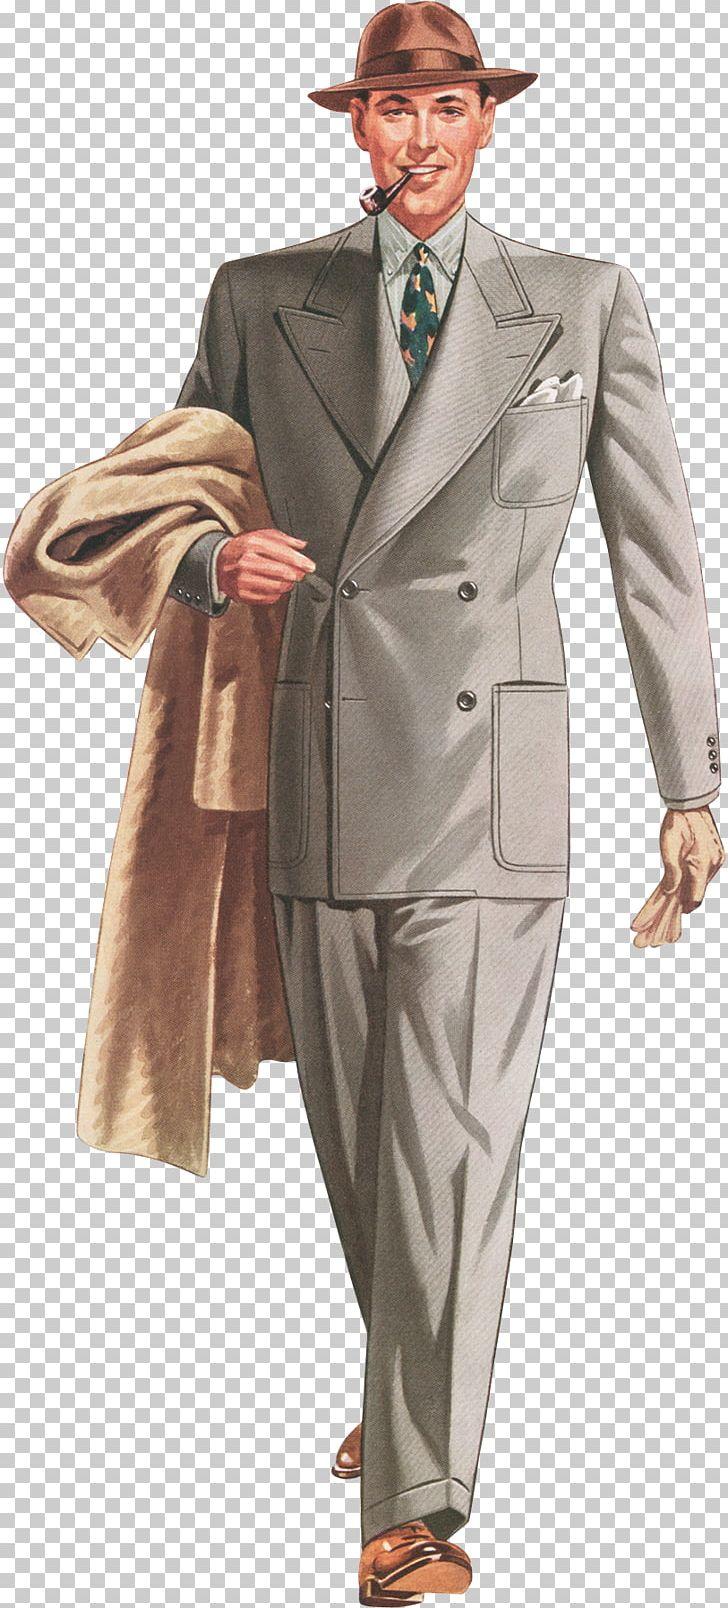 1930s 1940s Fashion Suit Vintage Clothing PNG, Clipart.